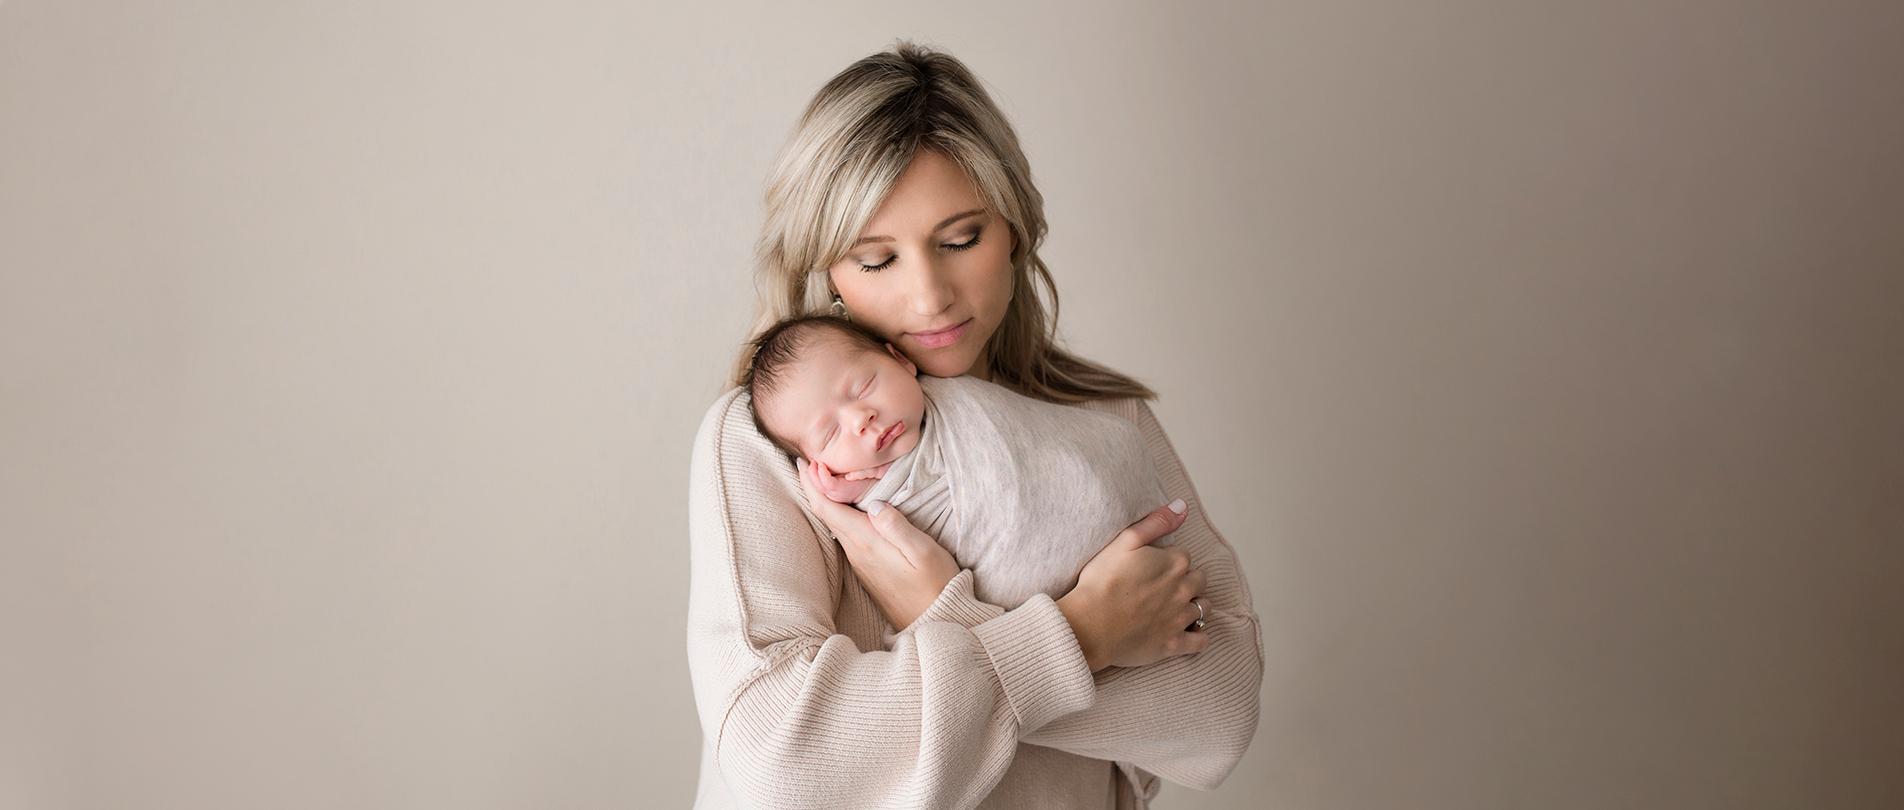 newborn photographer howell michigan brighton ann arbor 2020